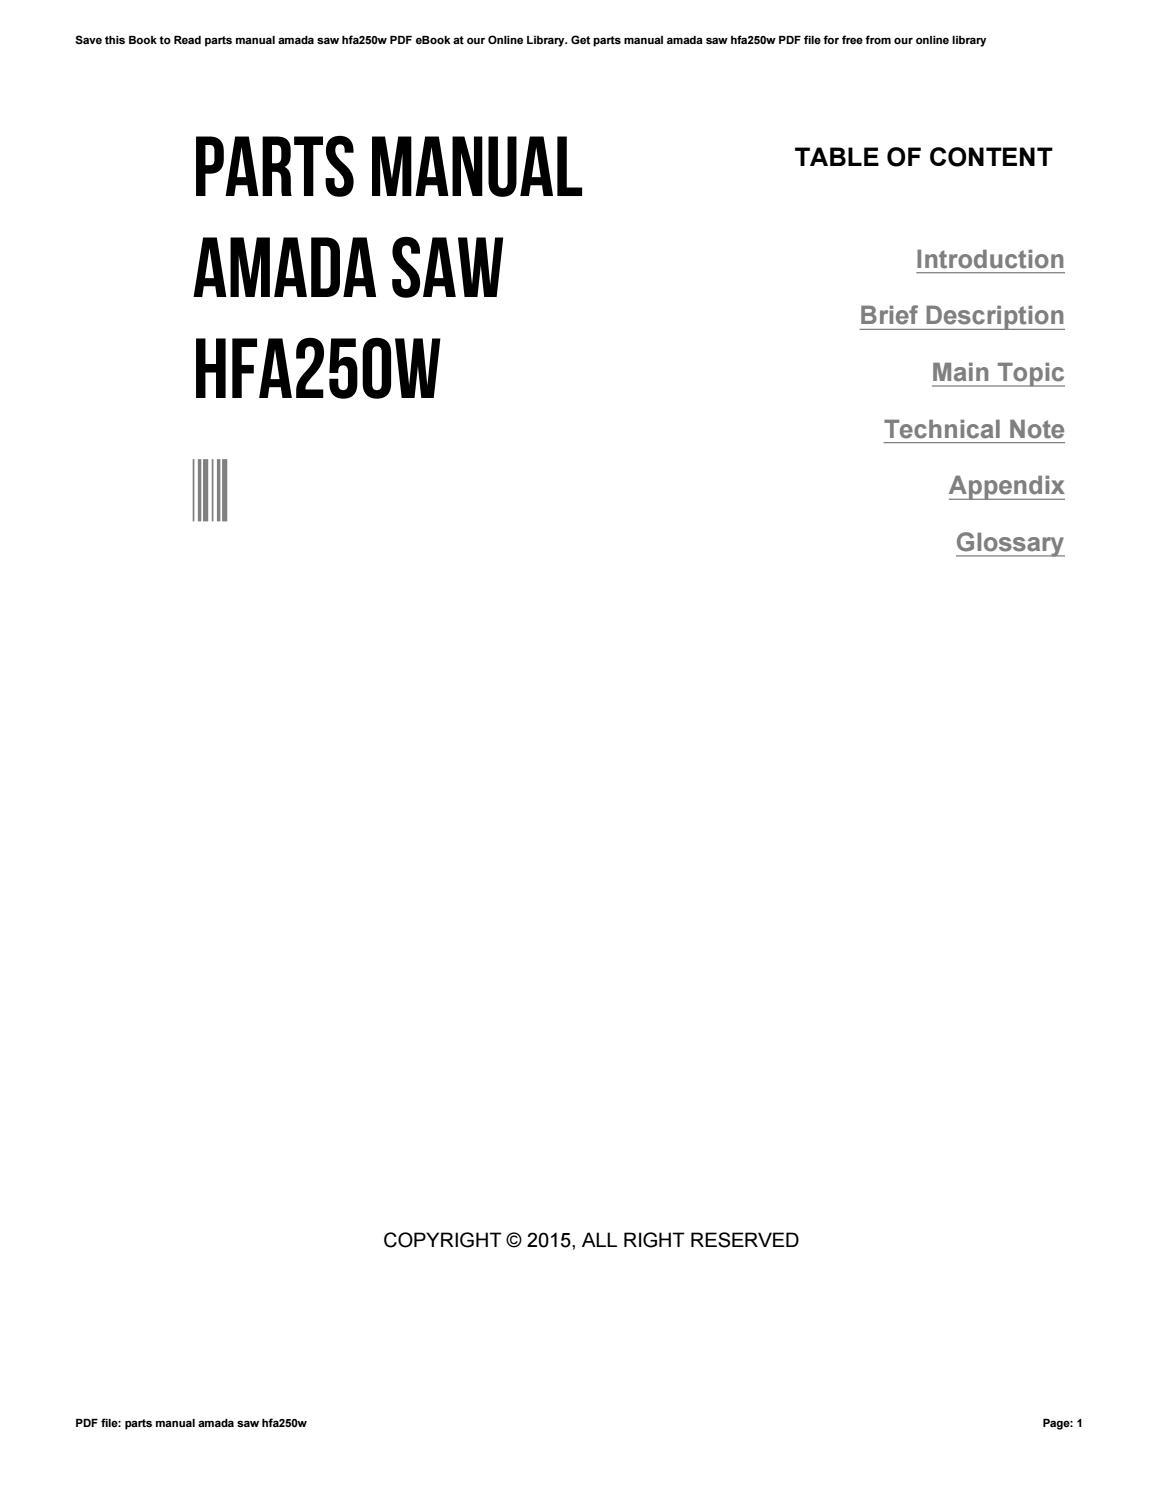 Amada User Manuals